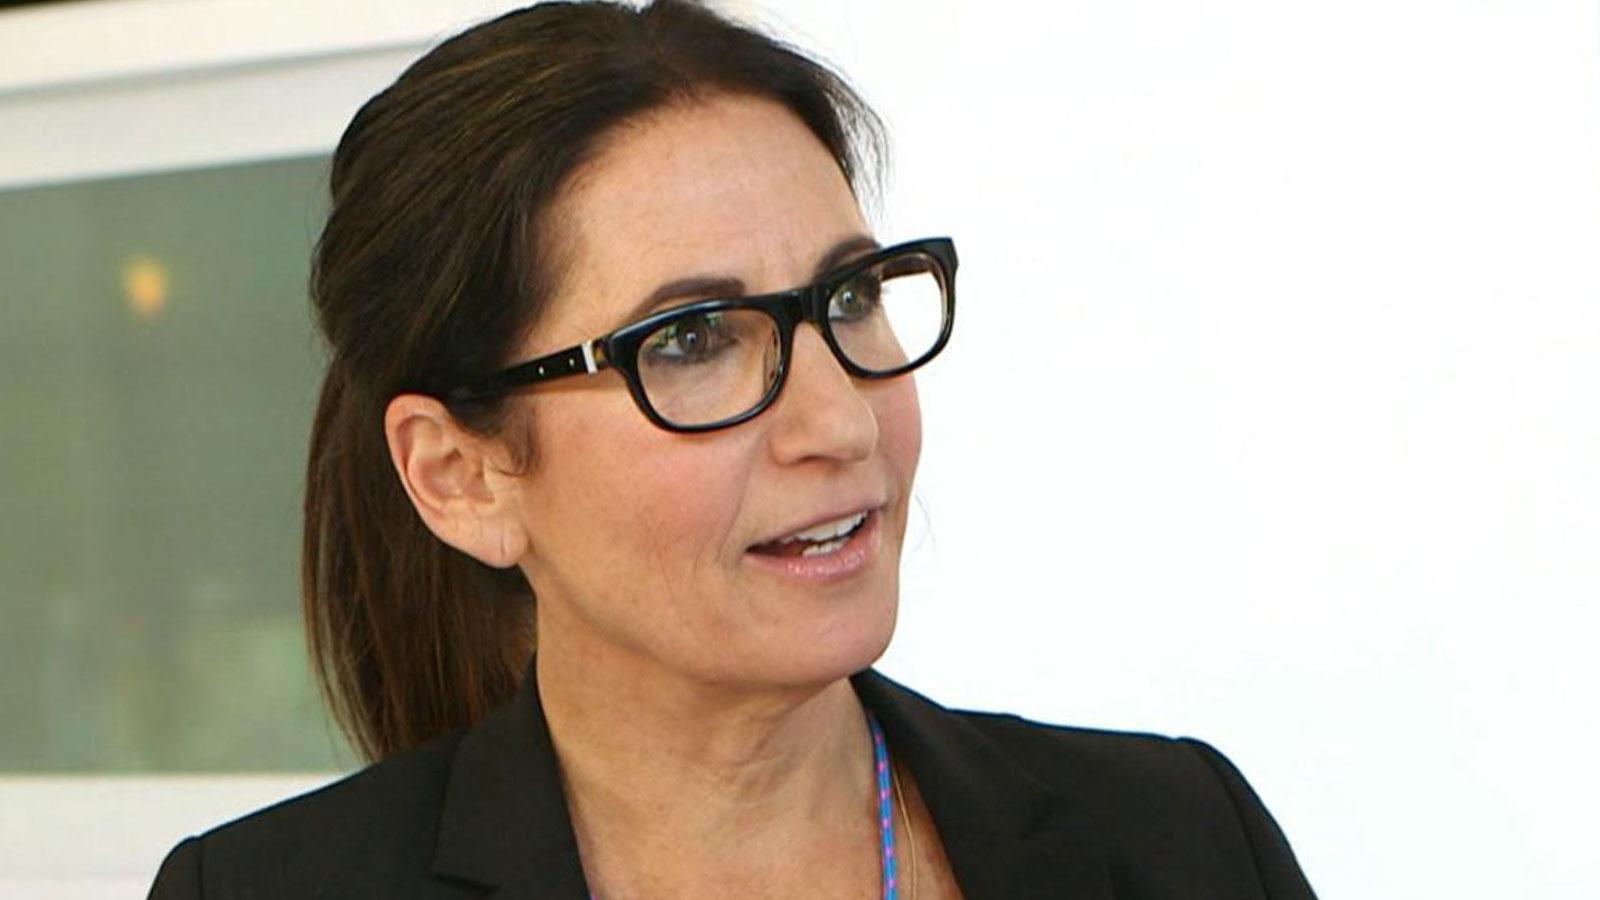 Bobbi Brown Videos at ABC News Video Archive at abcnews.com